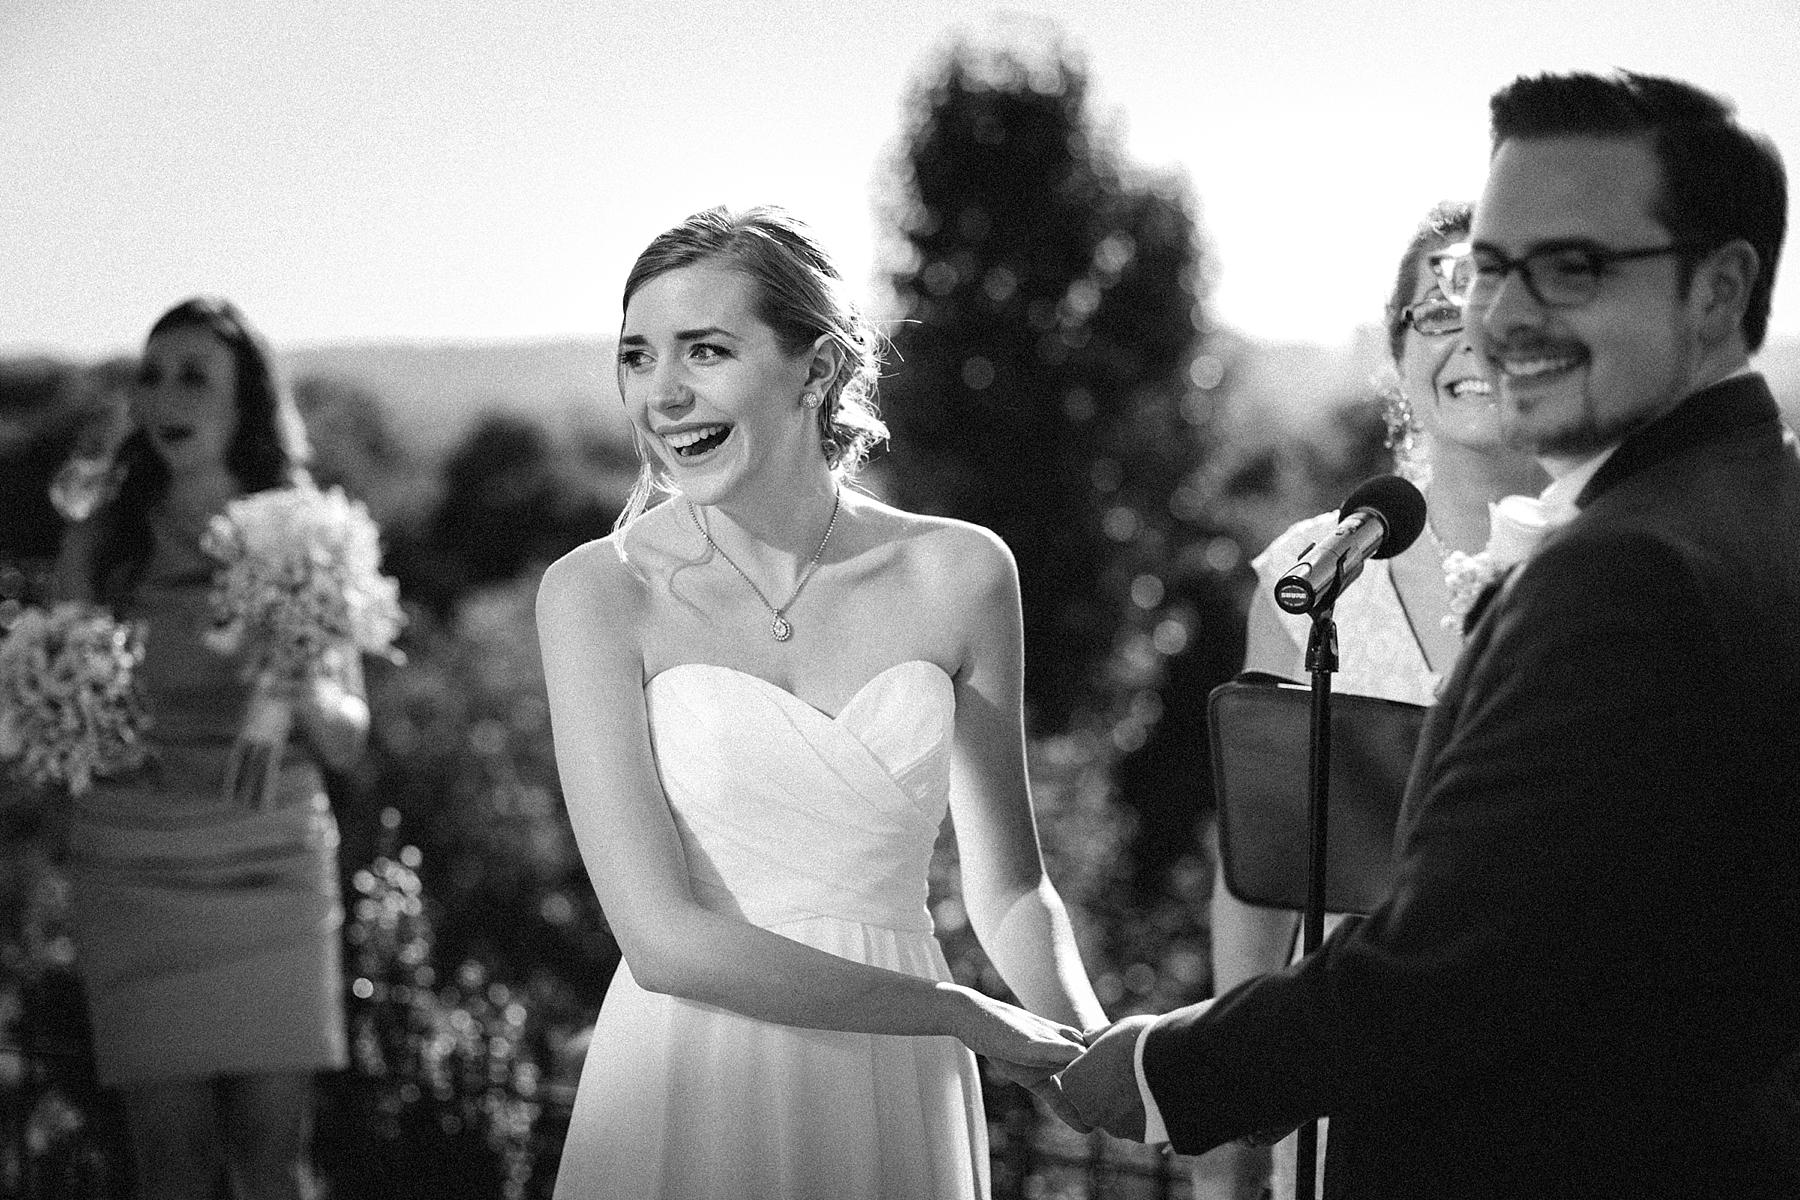 farm-wedding-engagement-session-destination-intimate_0072.jpg